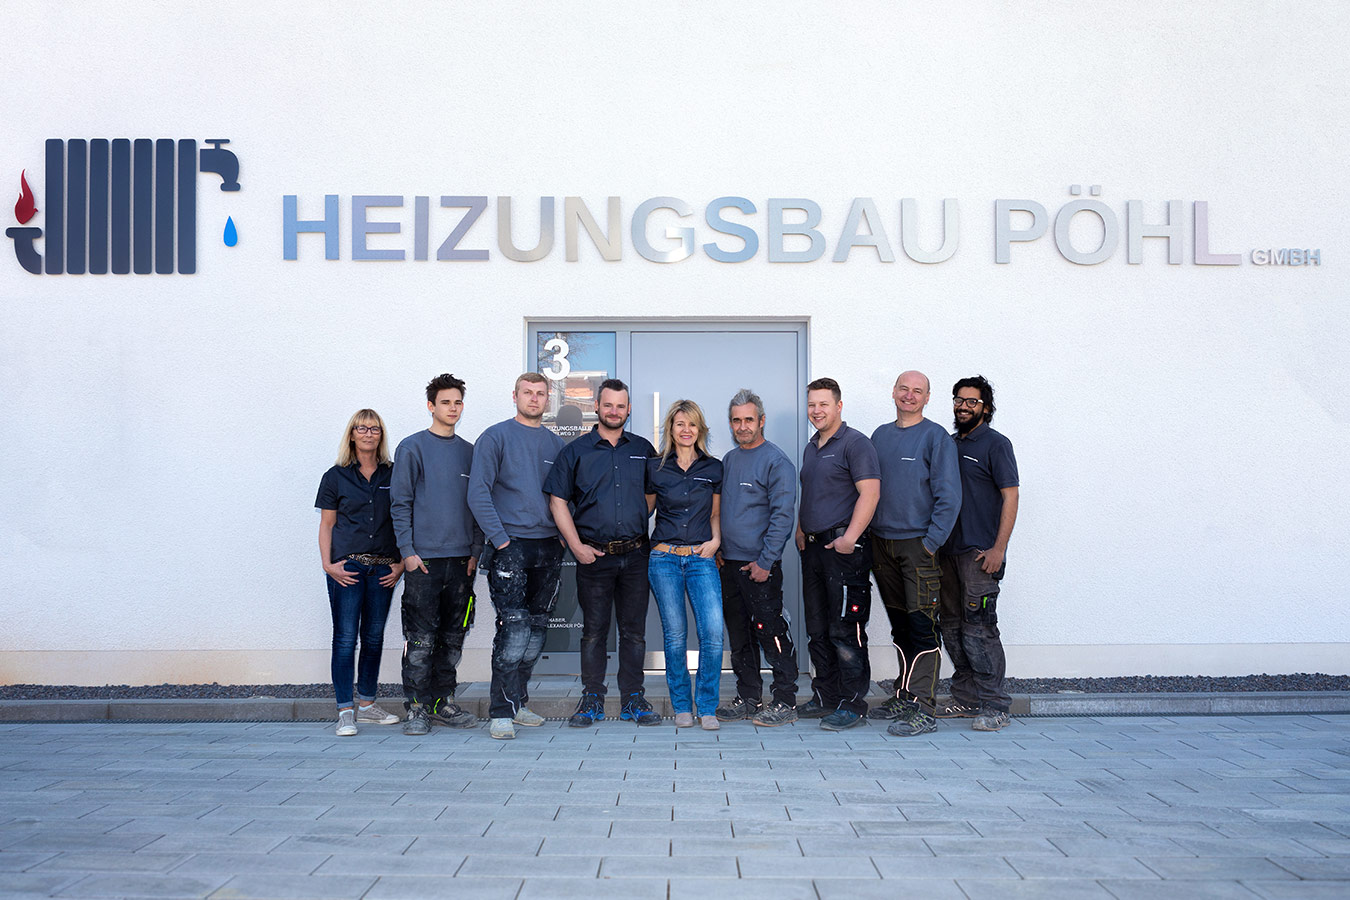 Fotograf Straubing | Buisness-Shooting | Heitungsbau Pöhl | Regensburg